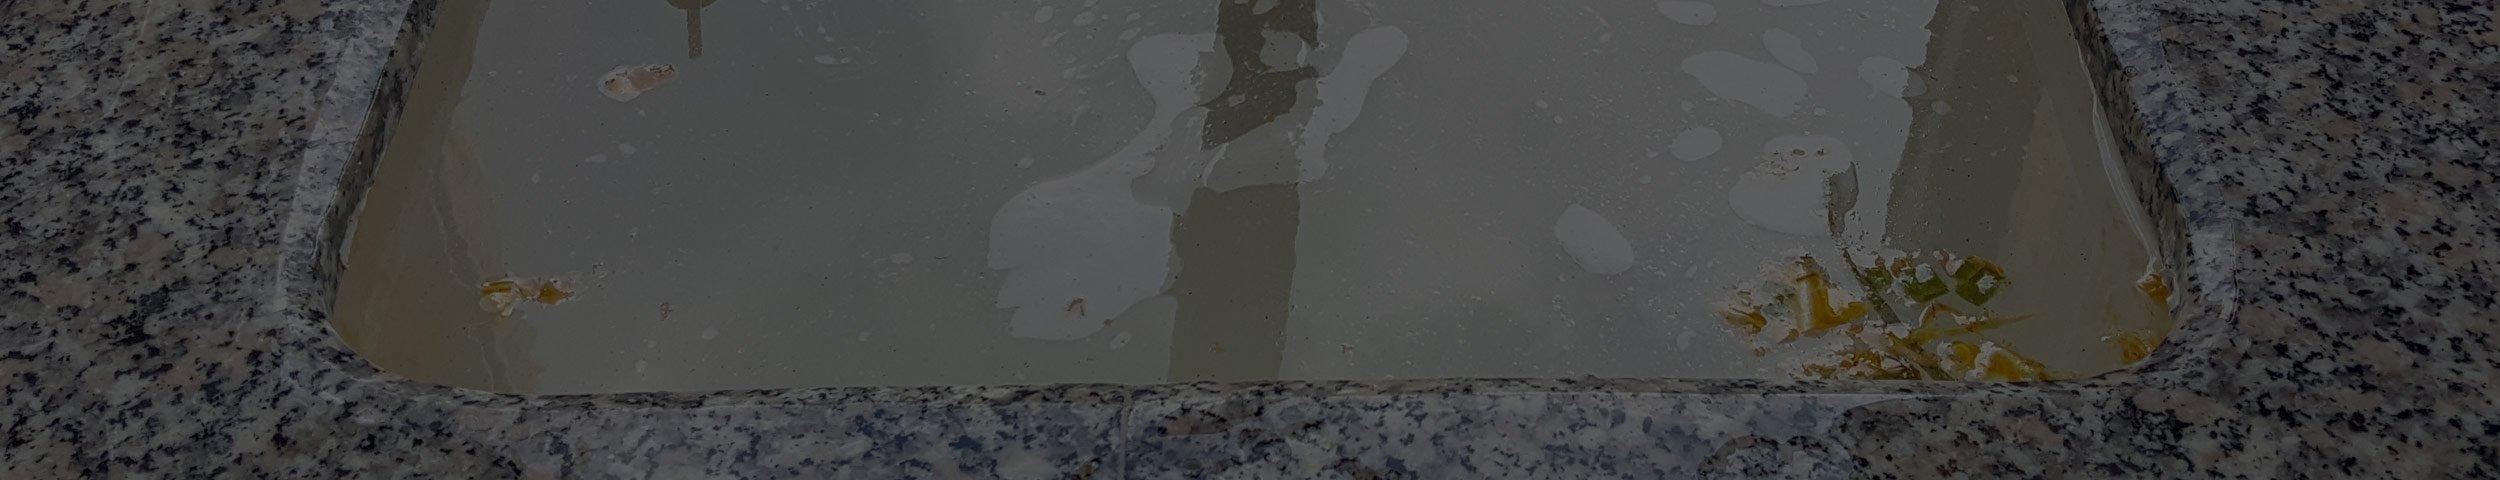 Sewage Damage Cleanup